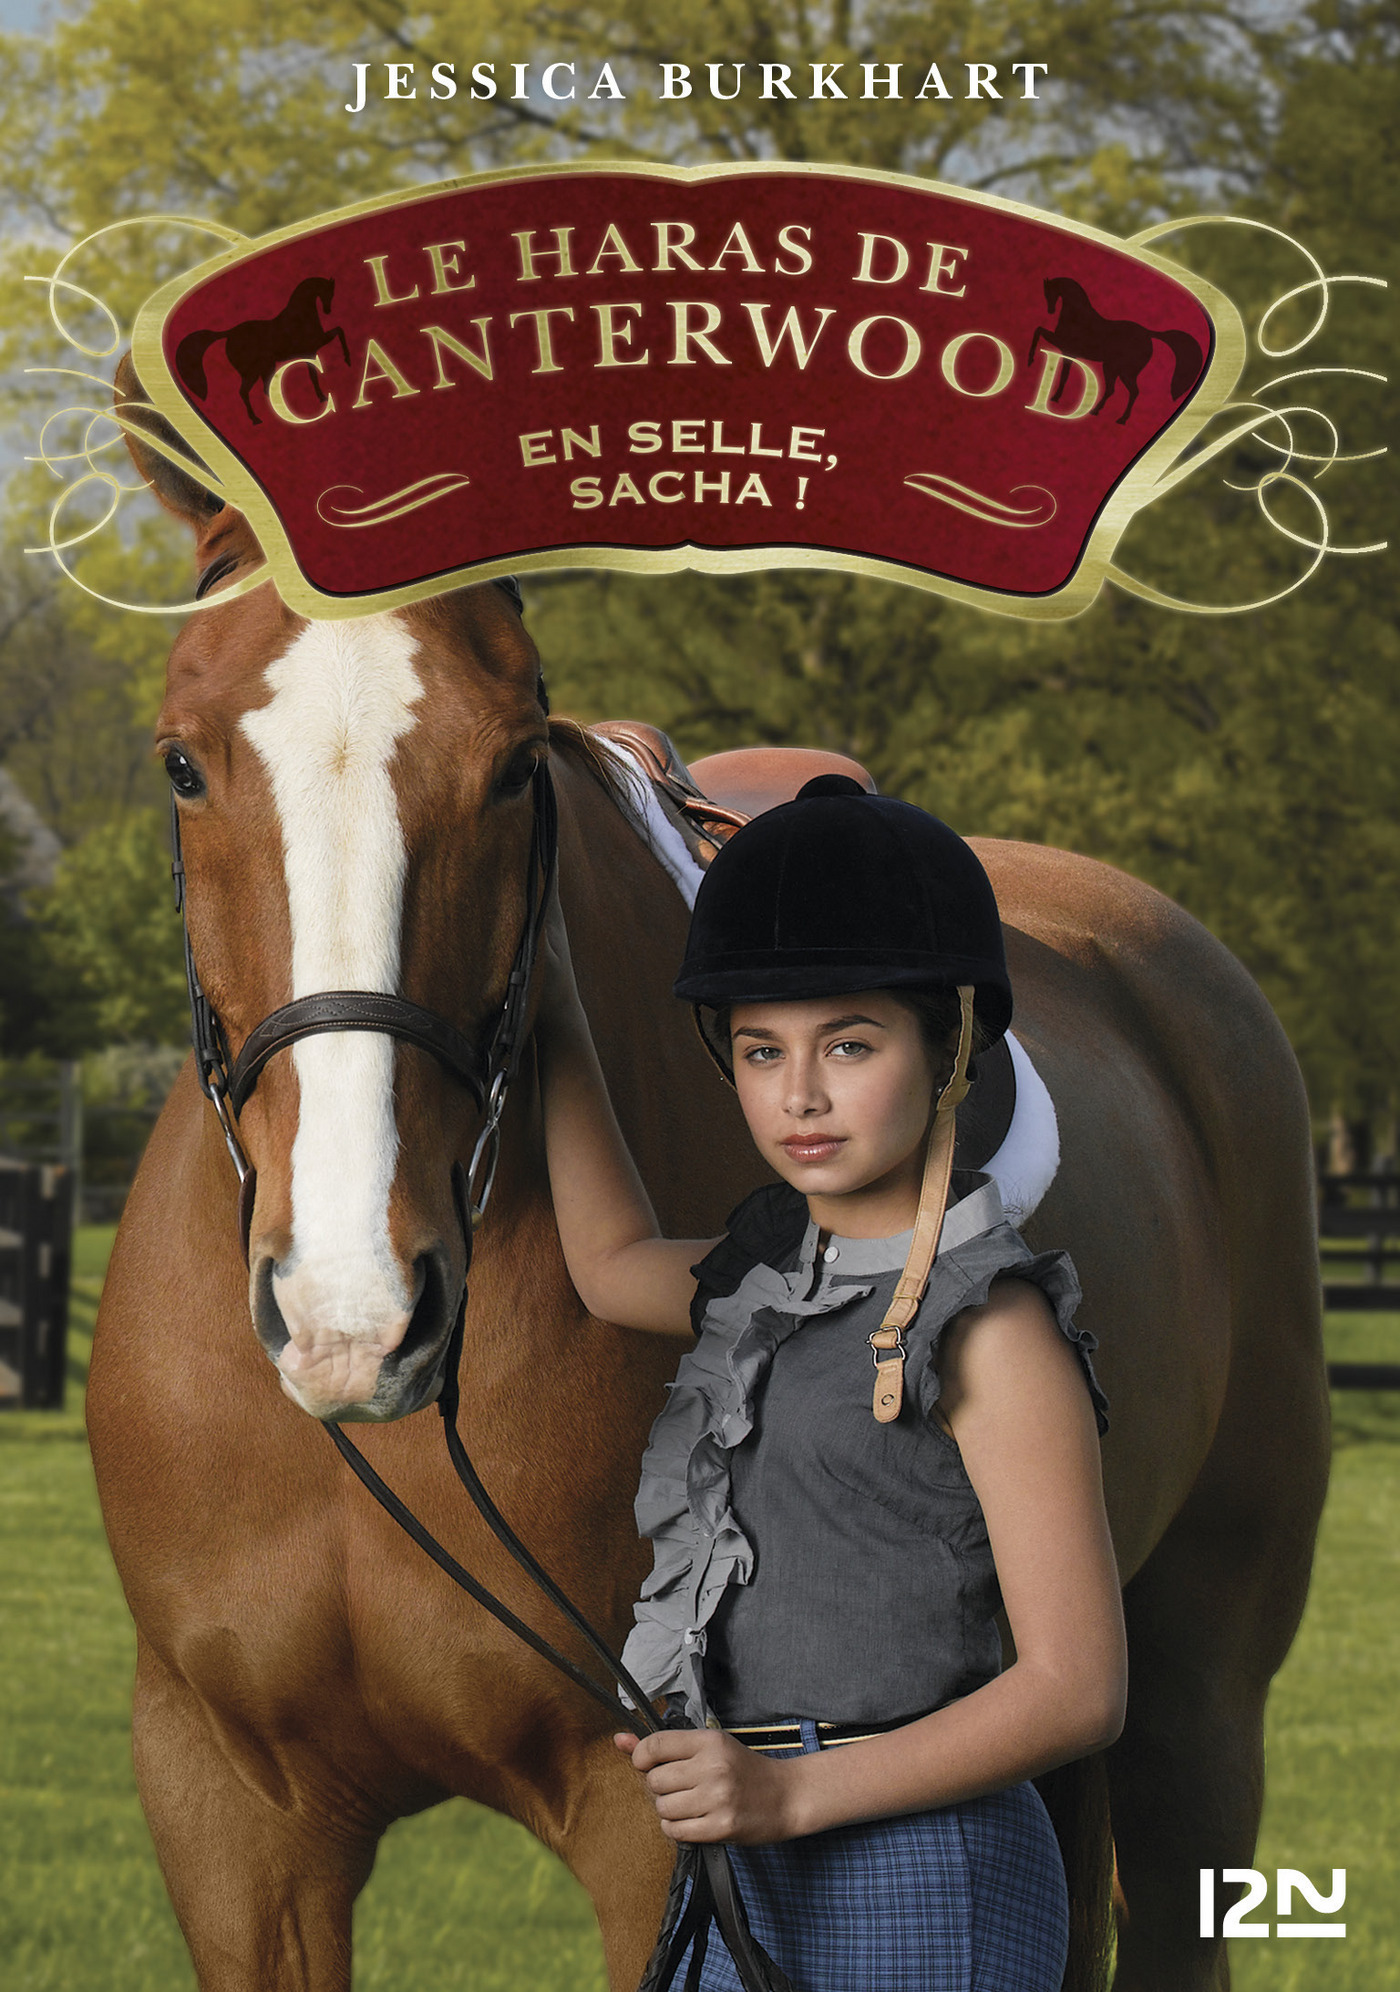 Le haras de Canterwood - tome 1 : En selle, Sacha !